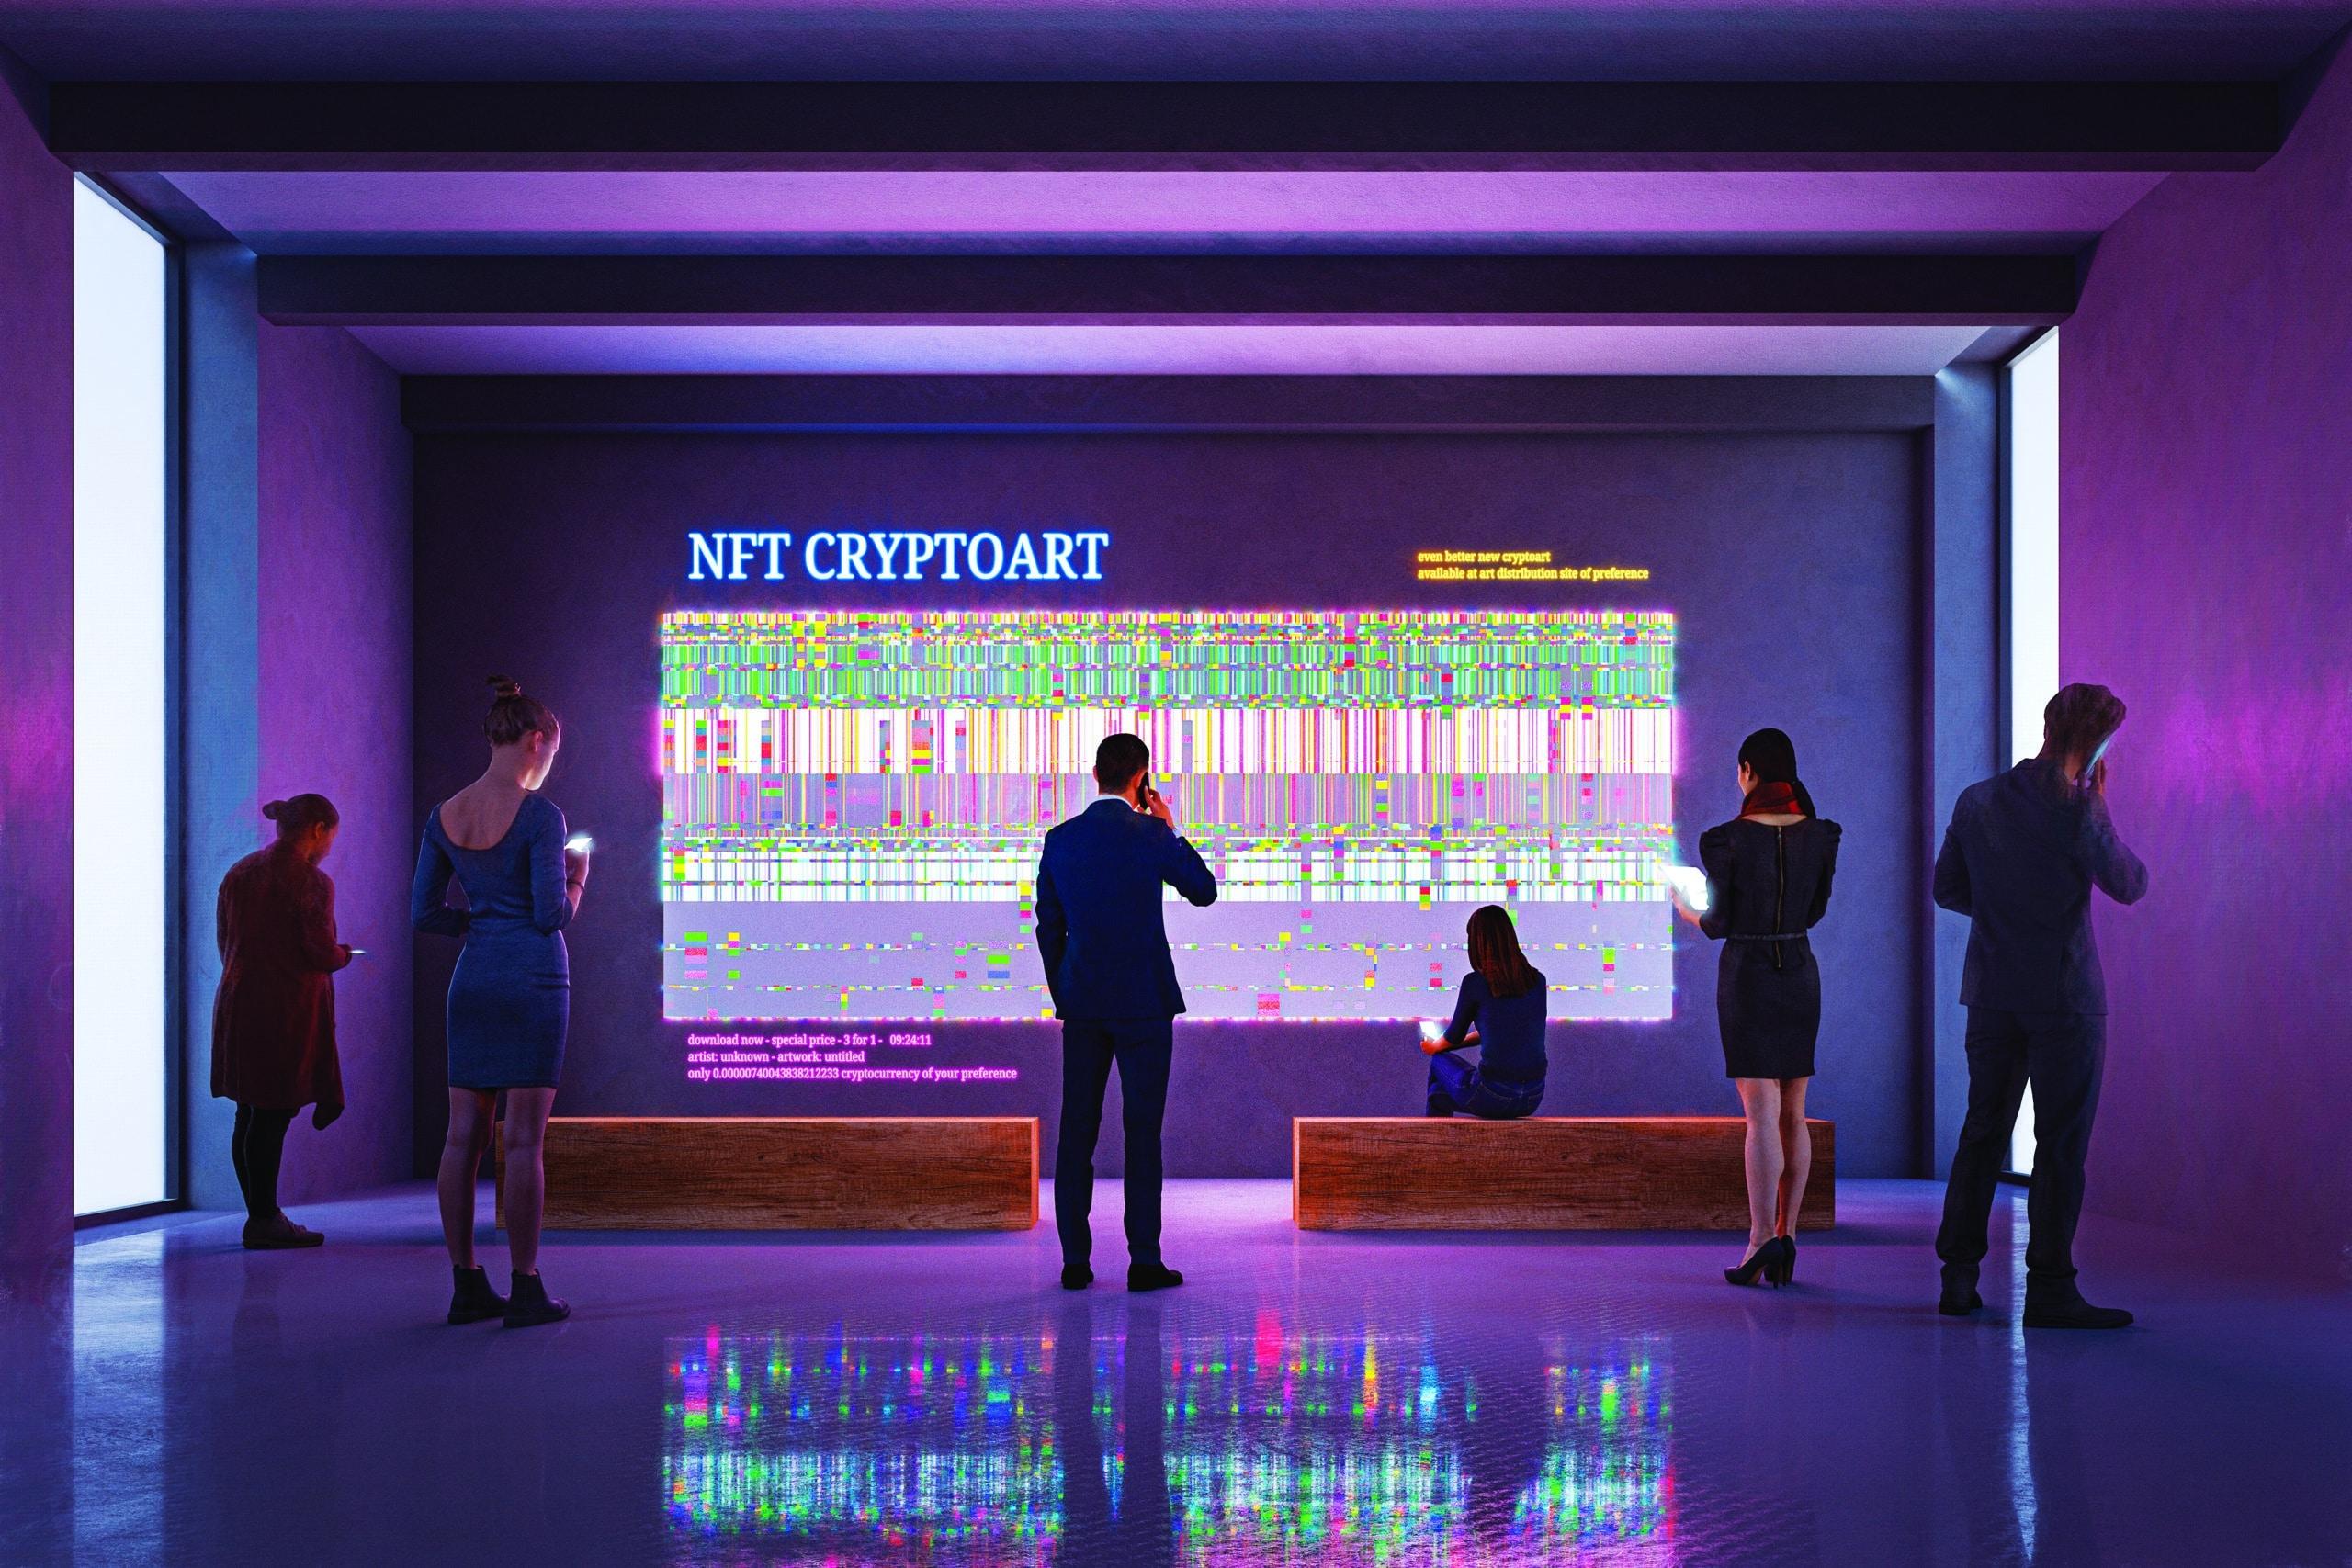 NFT CryptoArt display in art gallery